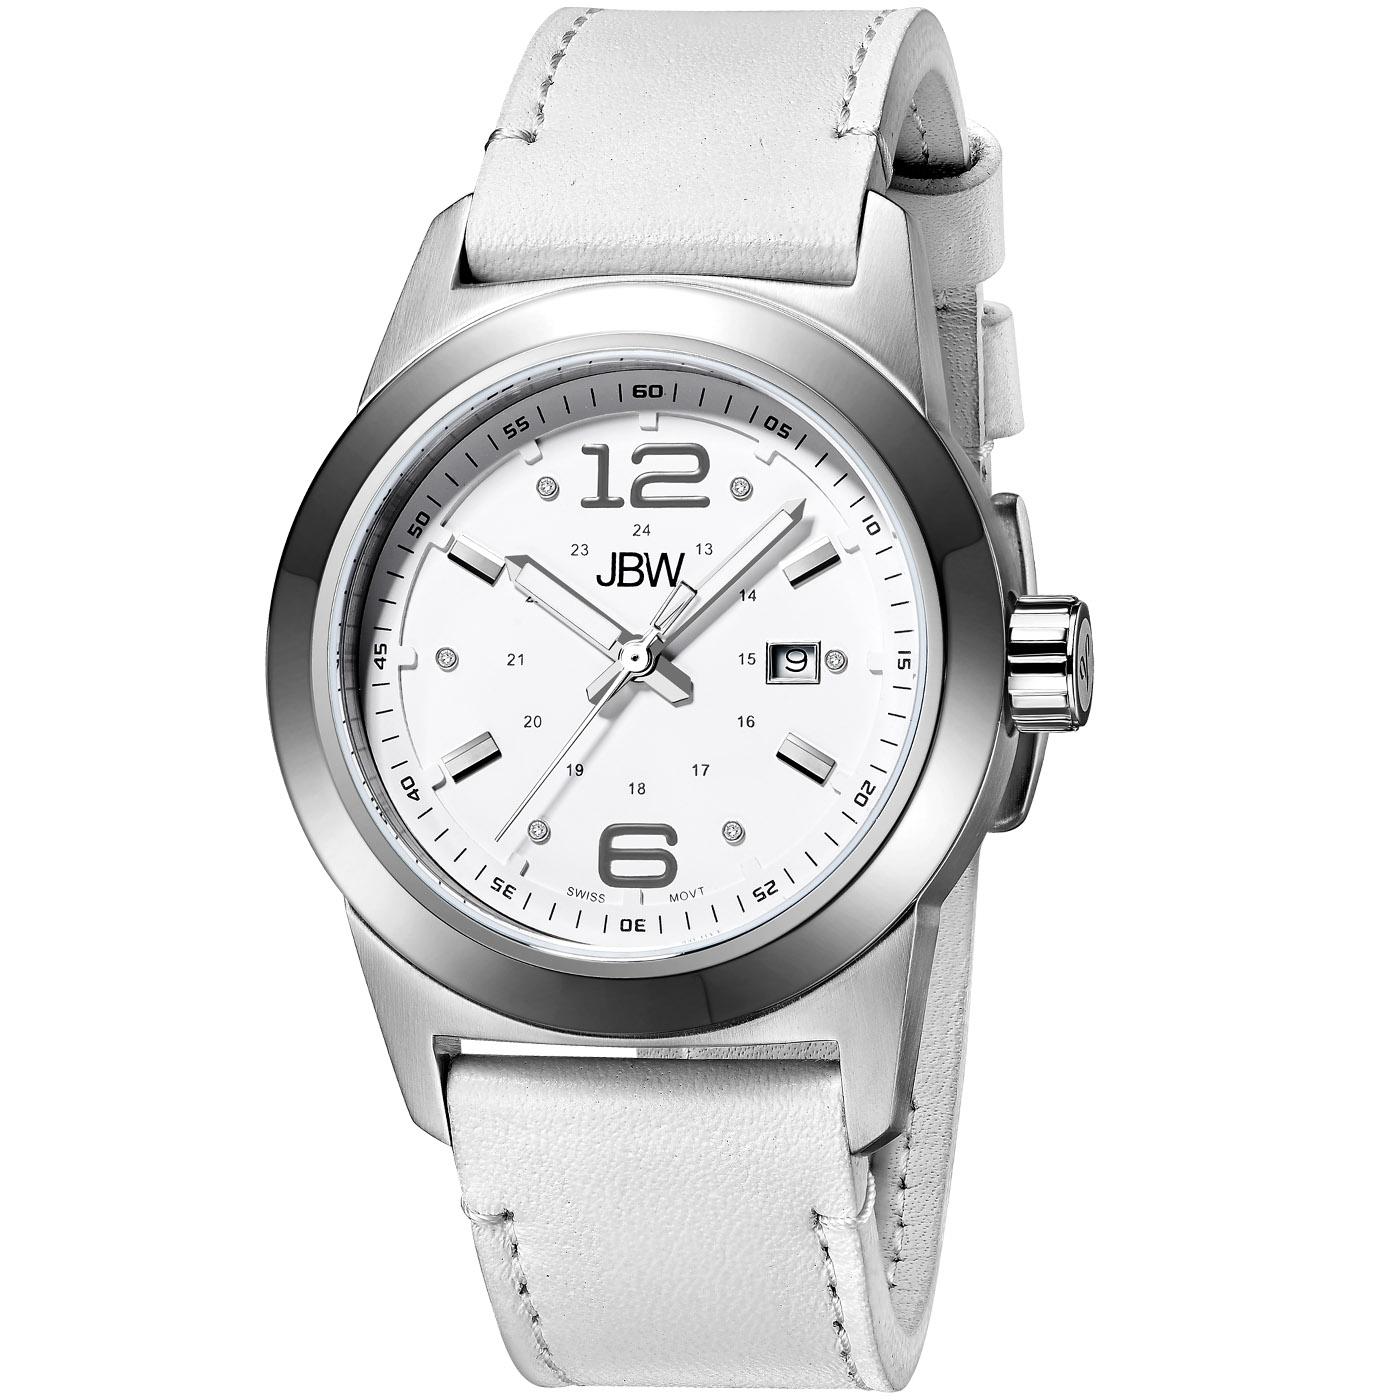 JBW Watches Magneto Men's Diamond Watch J6262E